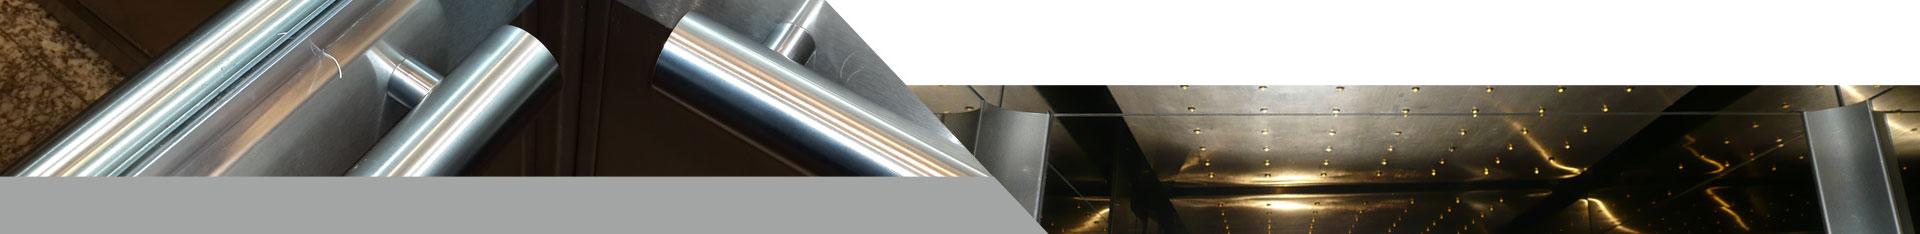 diseño de ascensores buenos aires